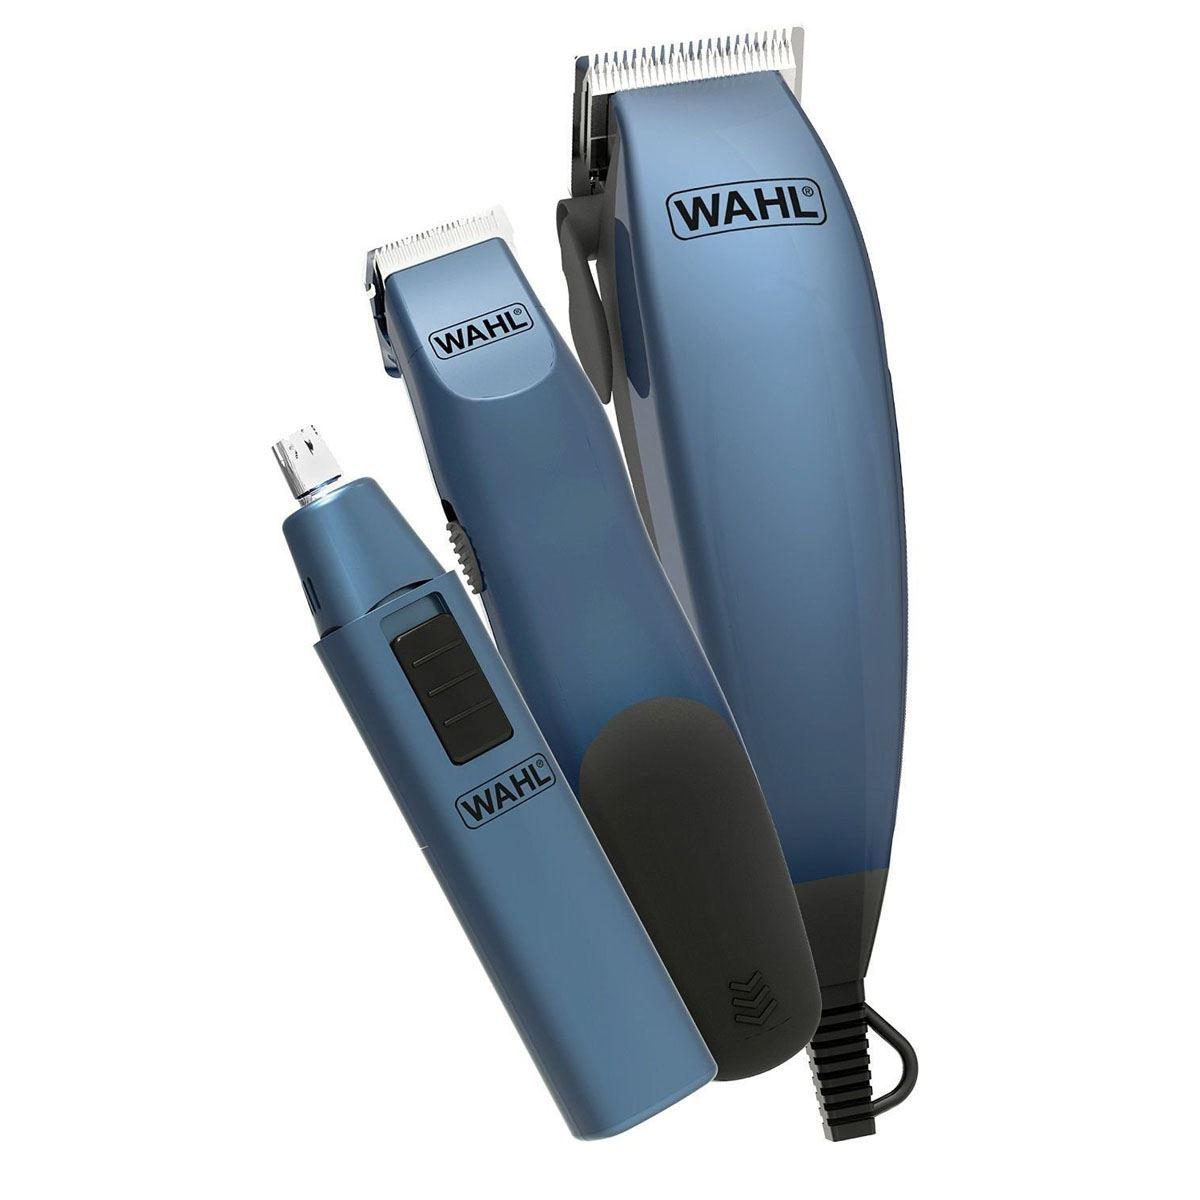 wahl 79305 2817 mens beard shaving clipper trimmer grooming kit valentines gift. Black Bedroom Furniture Sets. Home Design Ideas